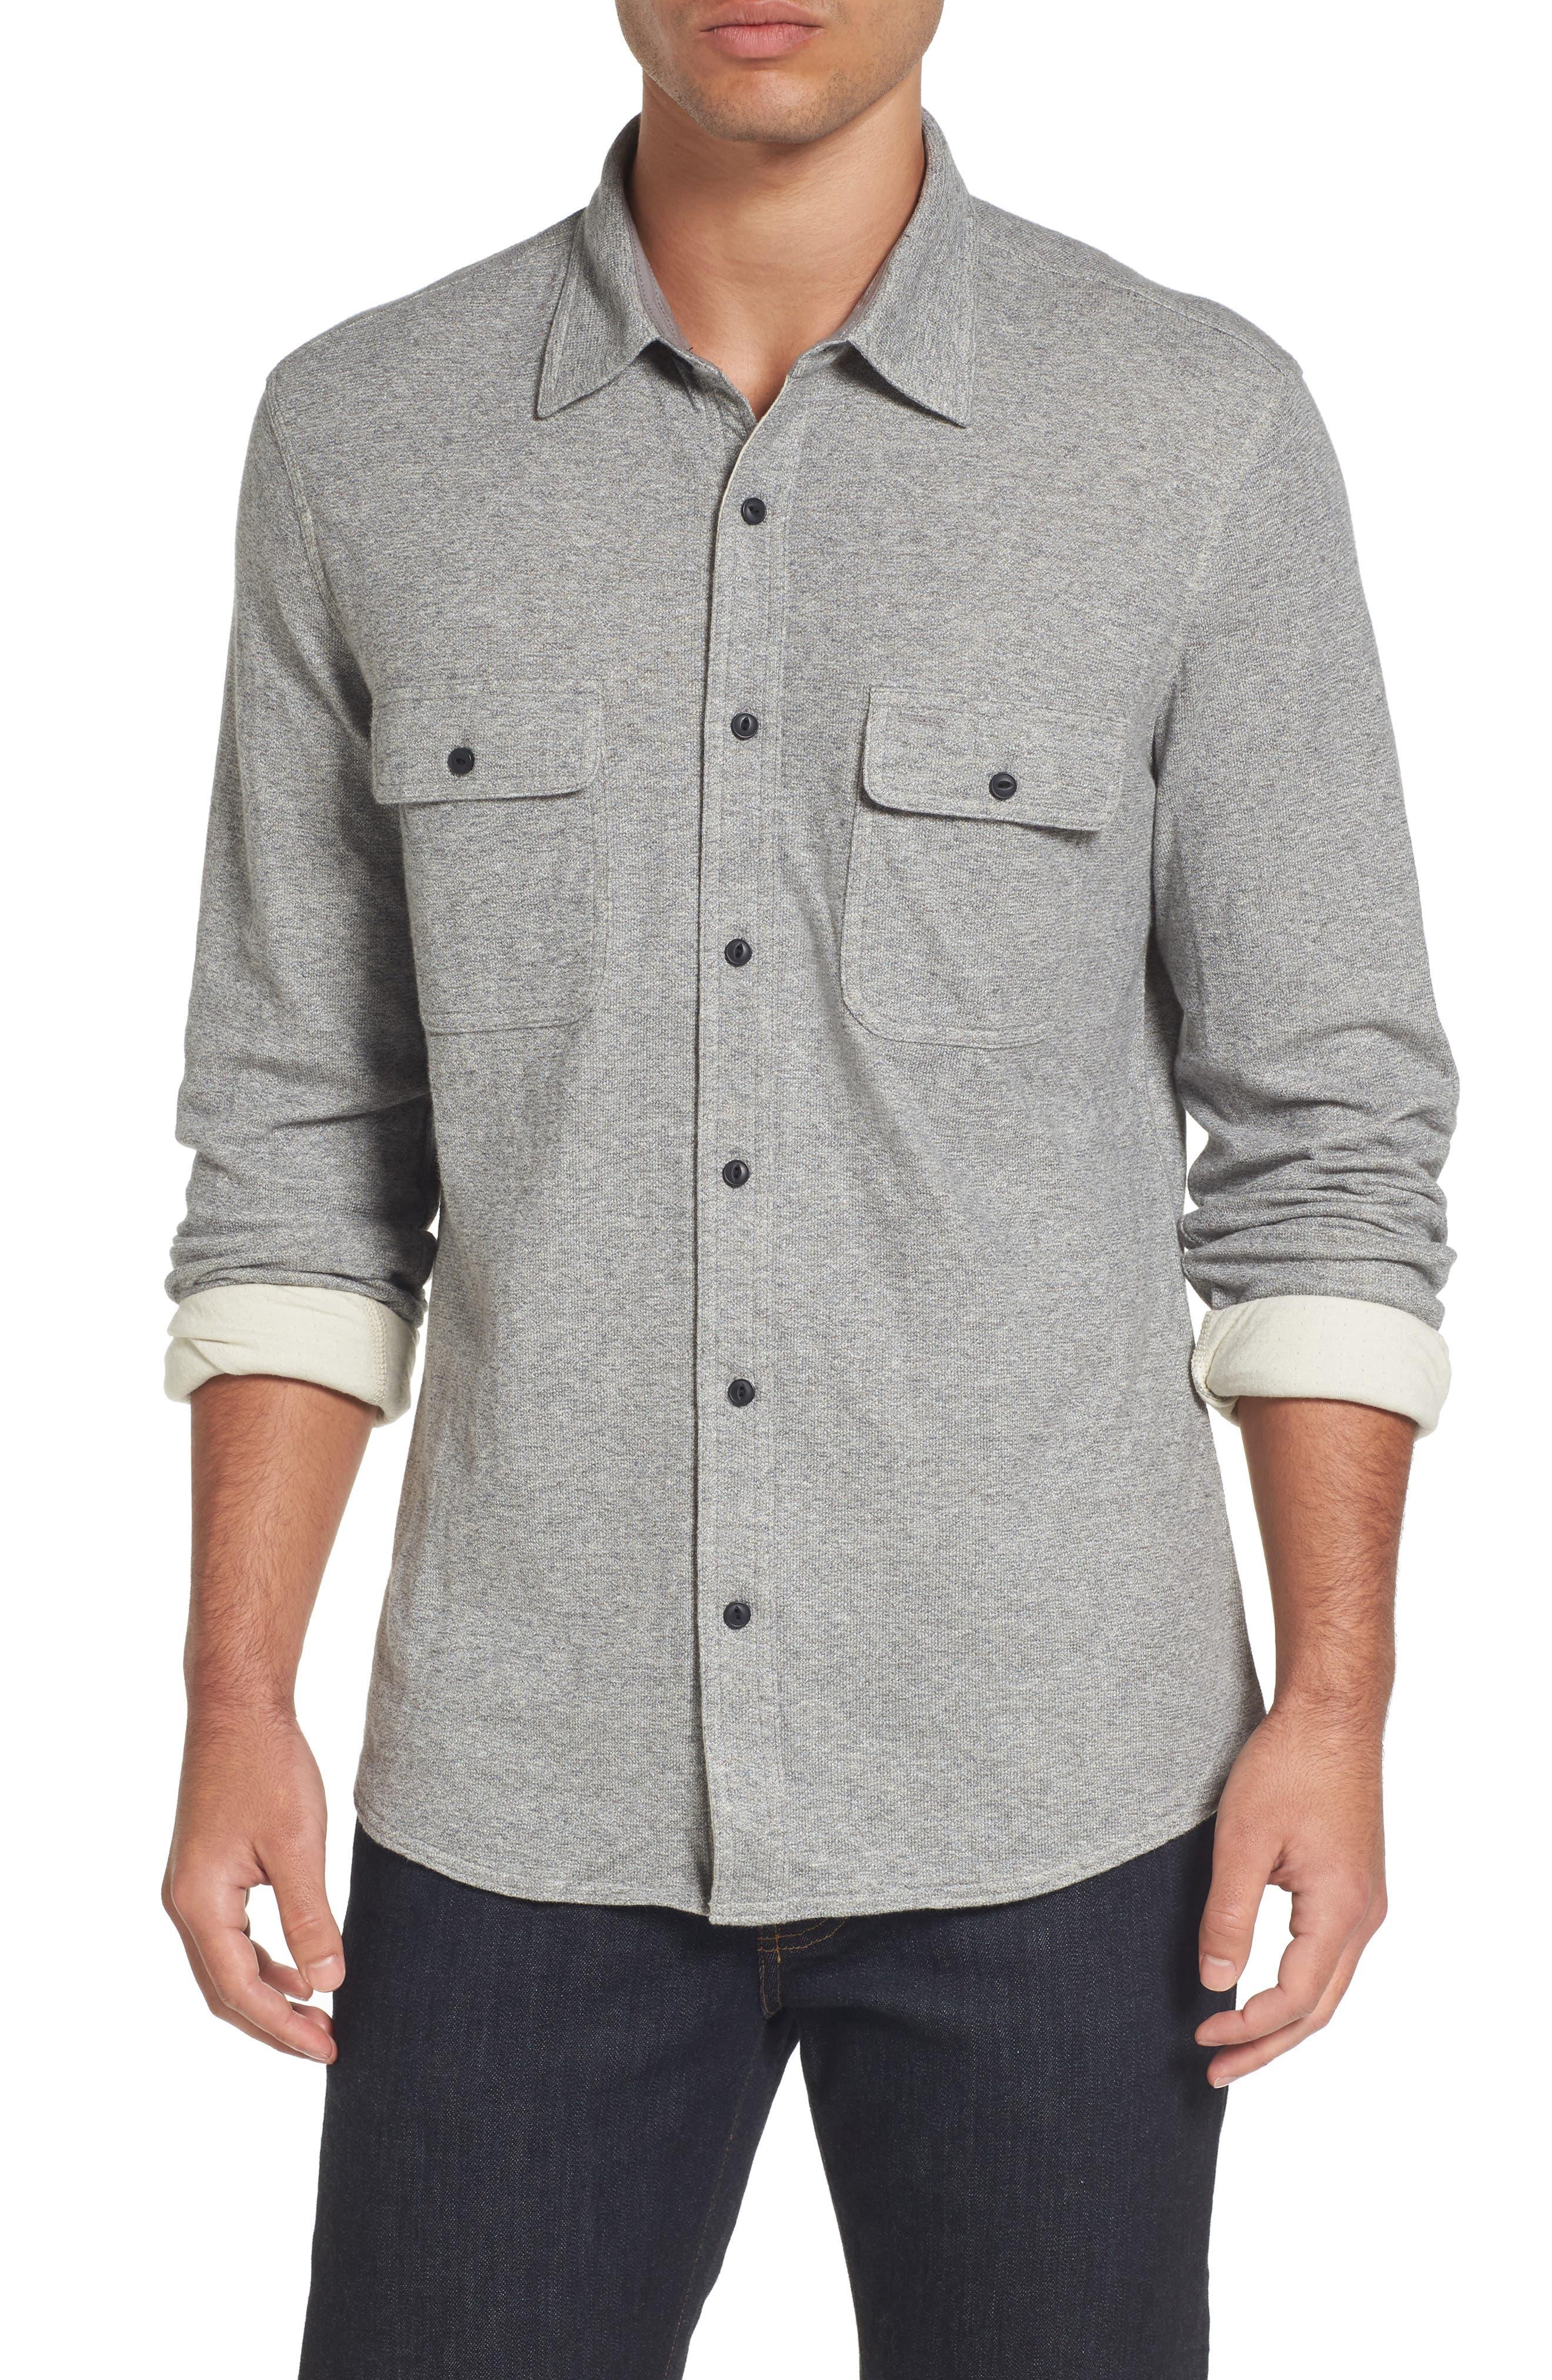 Main Image - Nordstrom Men's Shop Trim Fit Knit Sport Shirt (Tall)